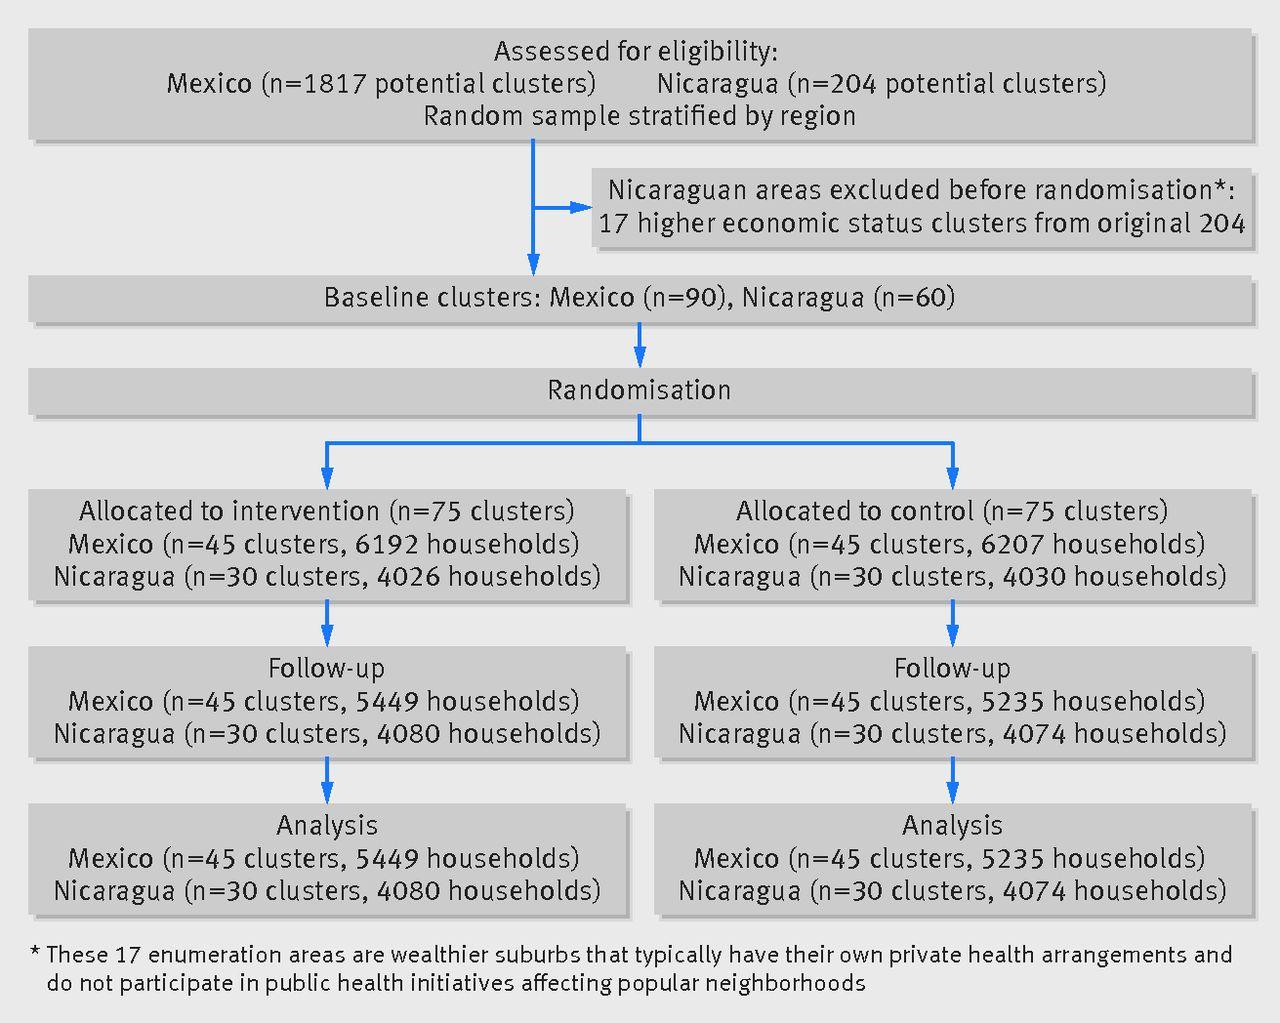 Evidence based community mobilization for dengue prevention in